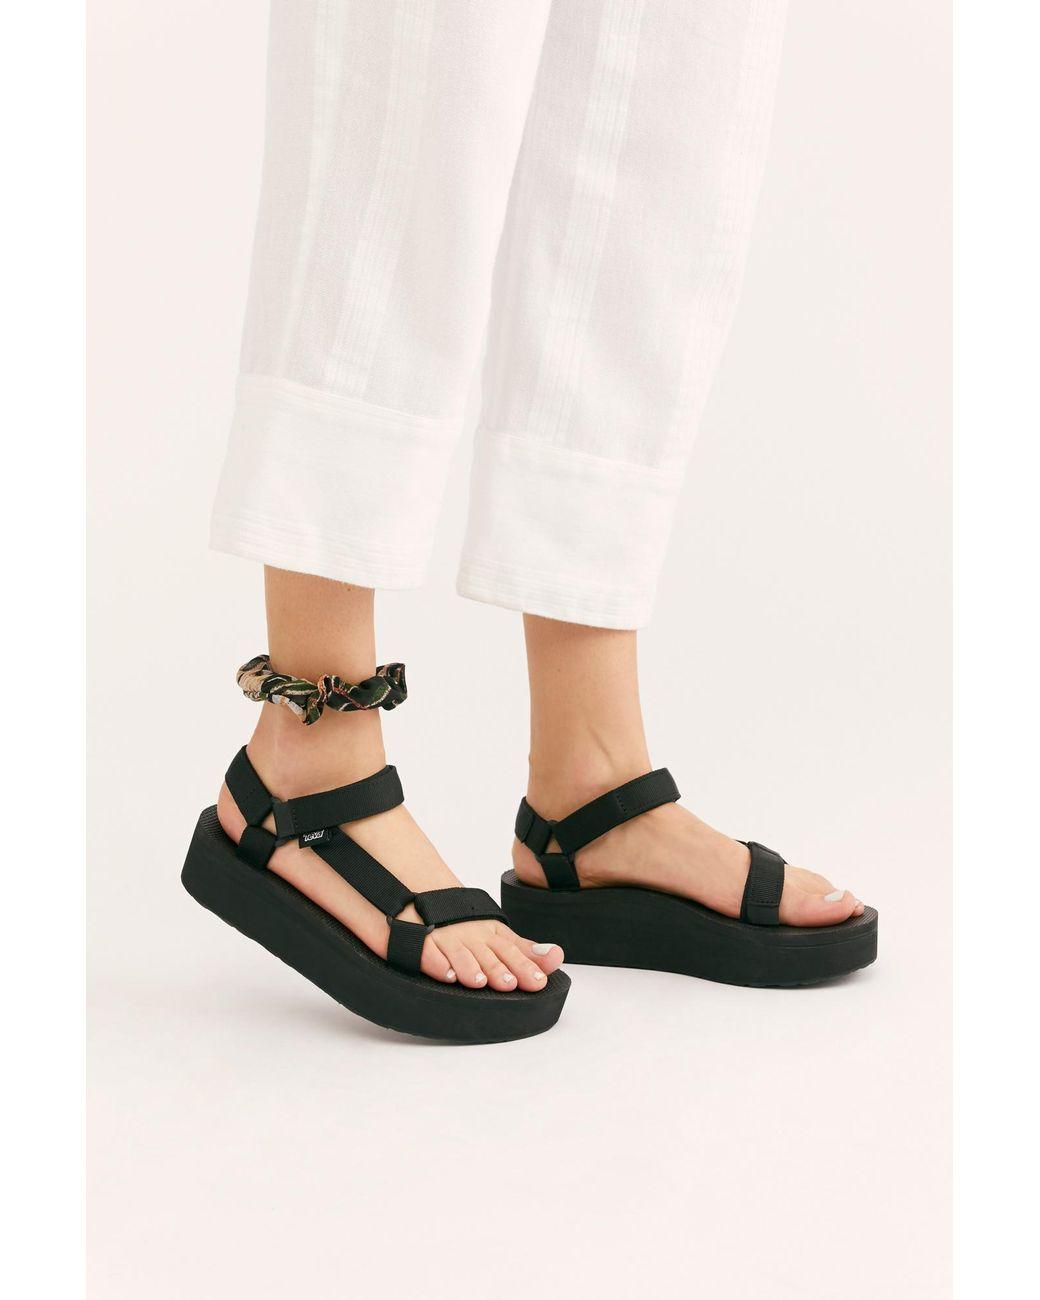 2179b20ecfe Free People Flatform Universal Teva Sandal in Black - Lyst